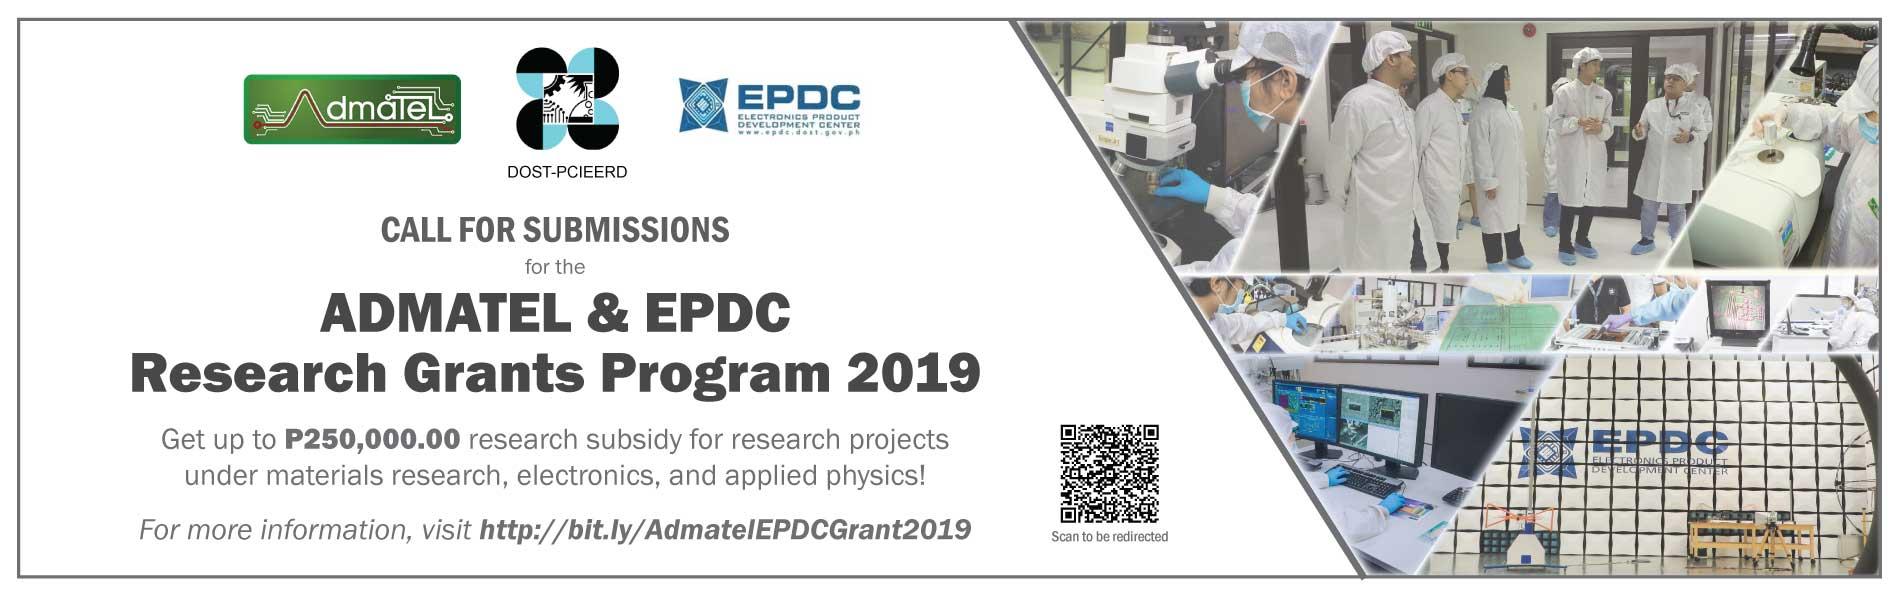 Admatel-EPDC Banner